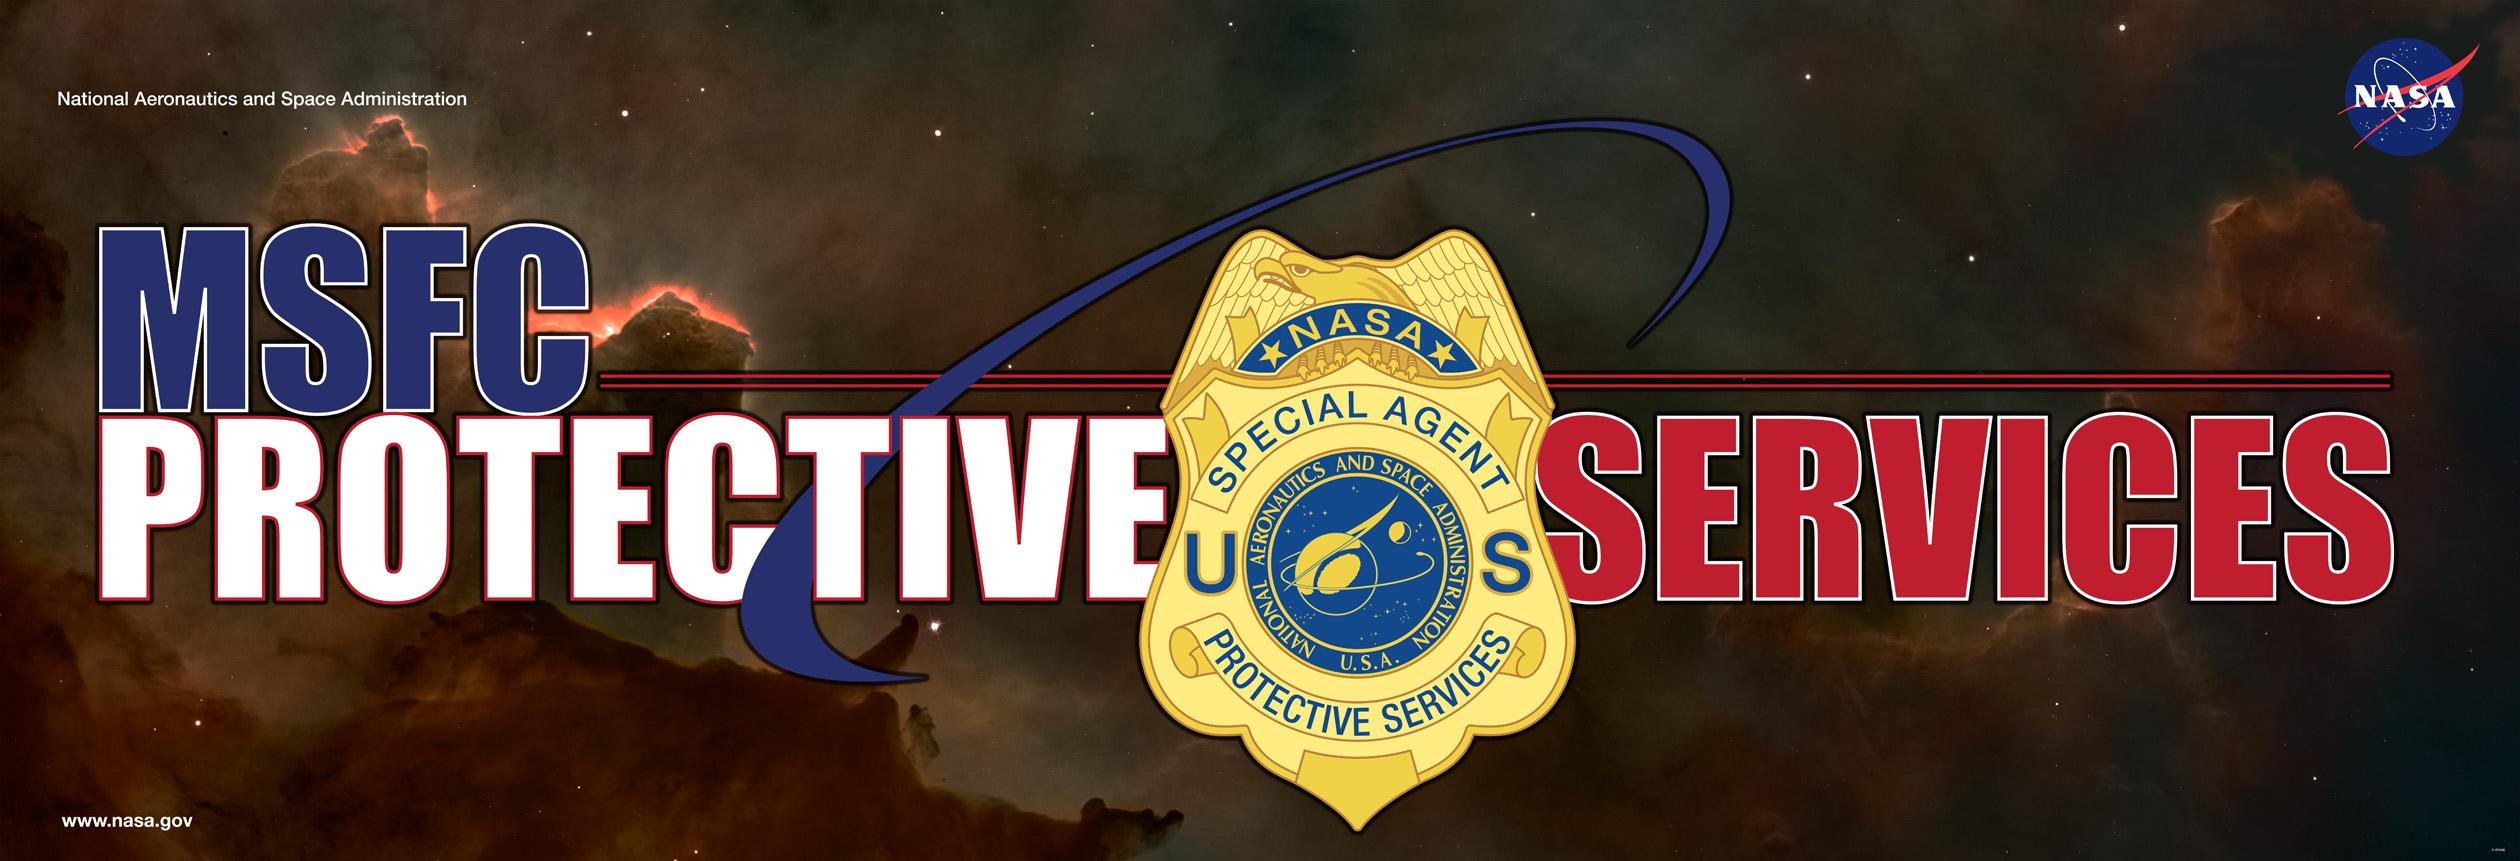 NASA Protective Services Logo - Pics about space